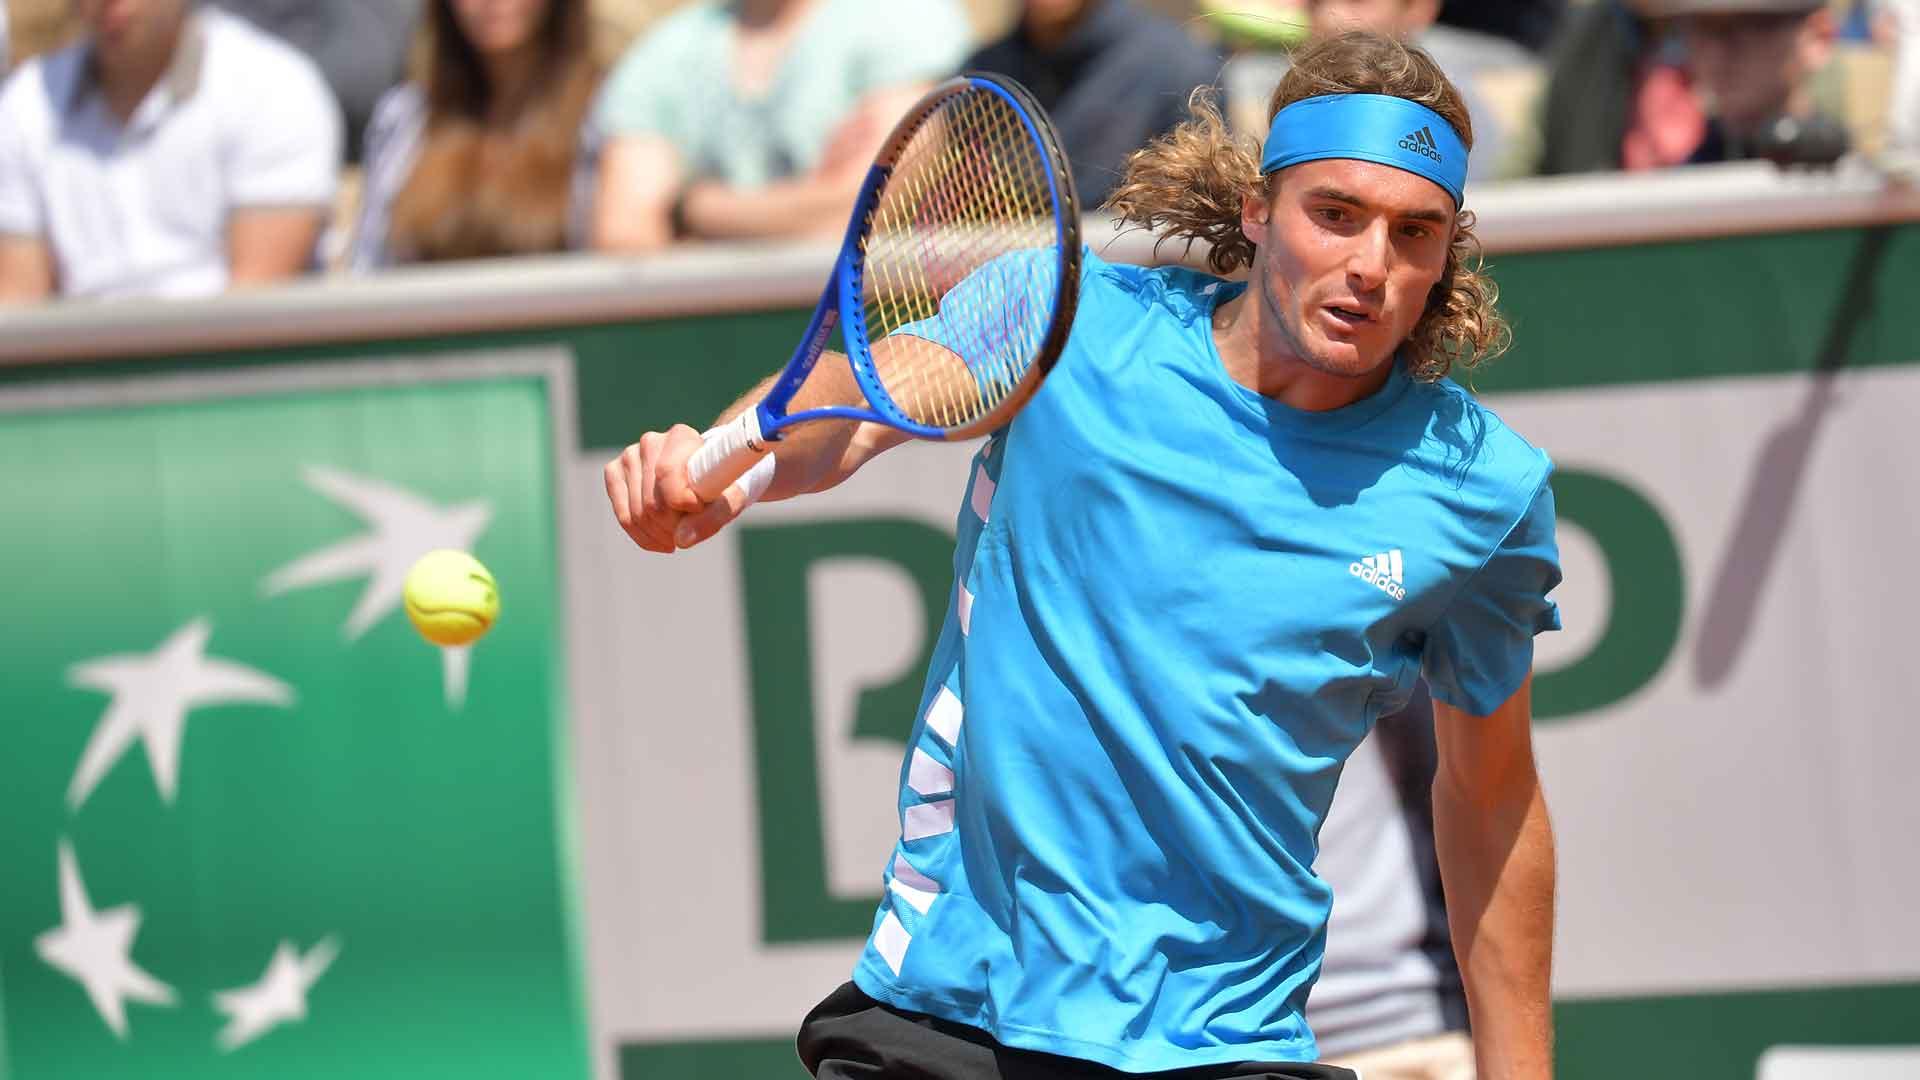 Tsitsipas Pumped Up After Dellien Win At Roland Garros   ATP